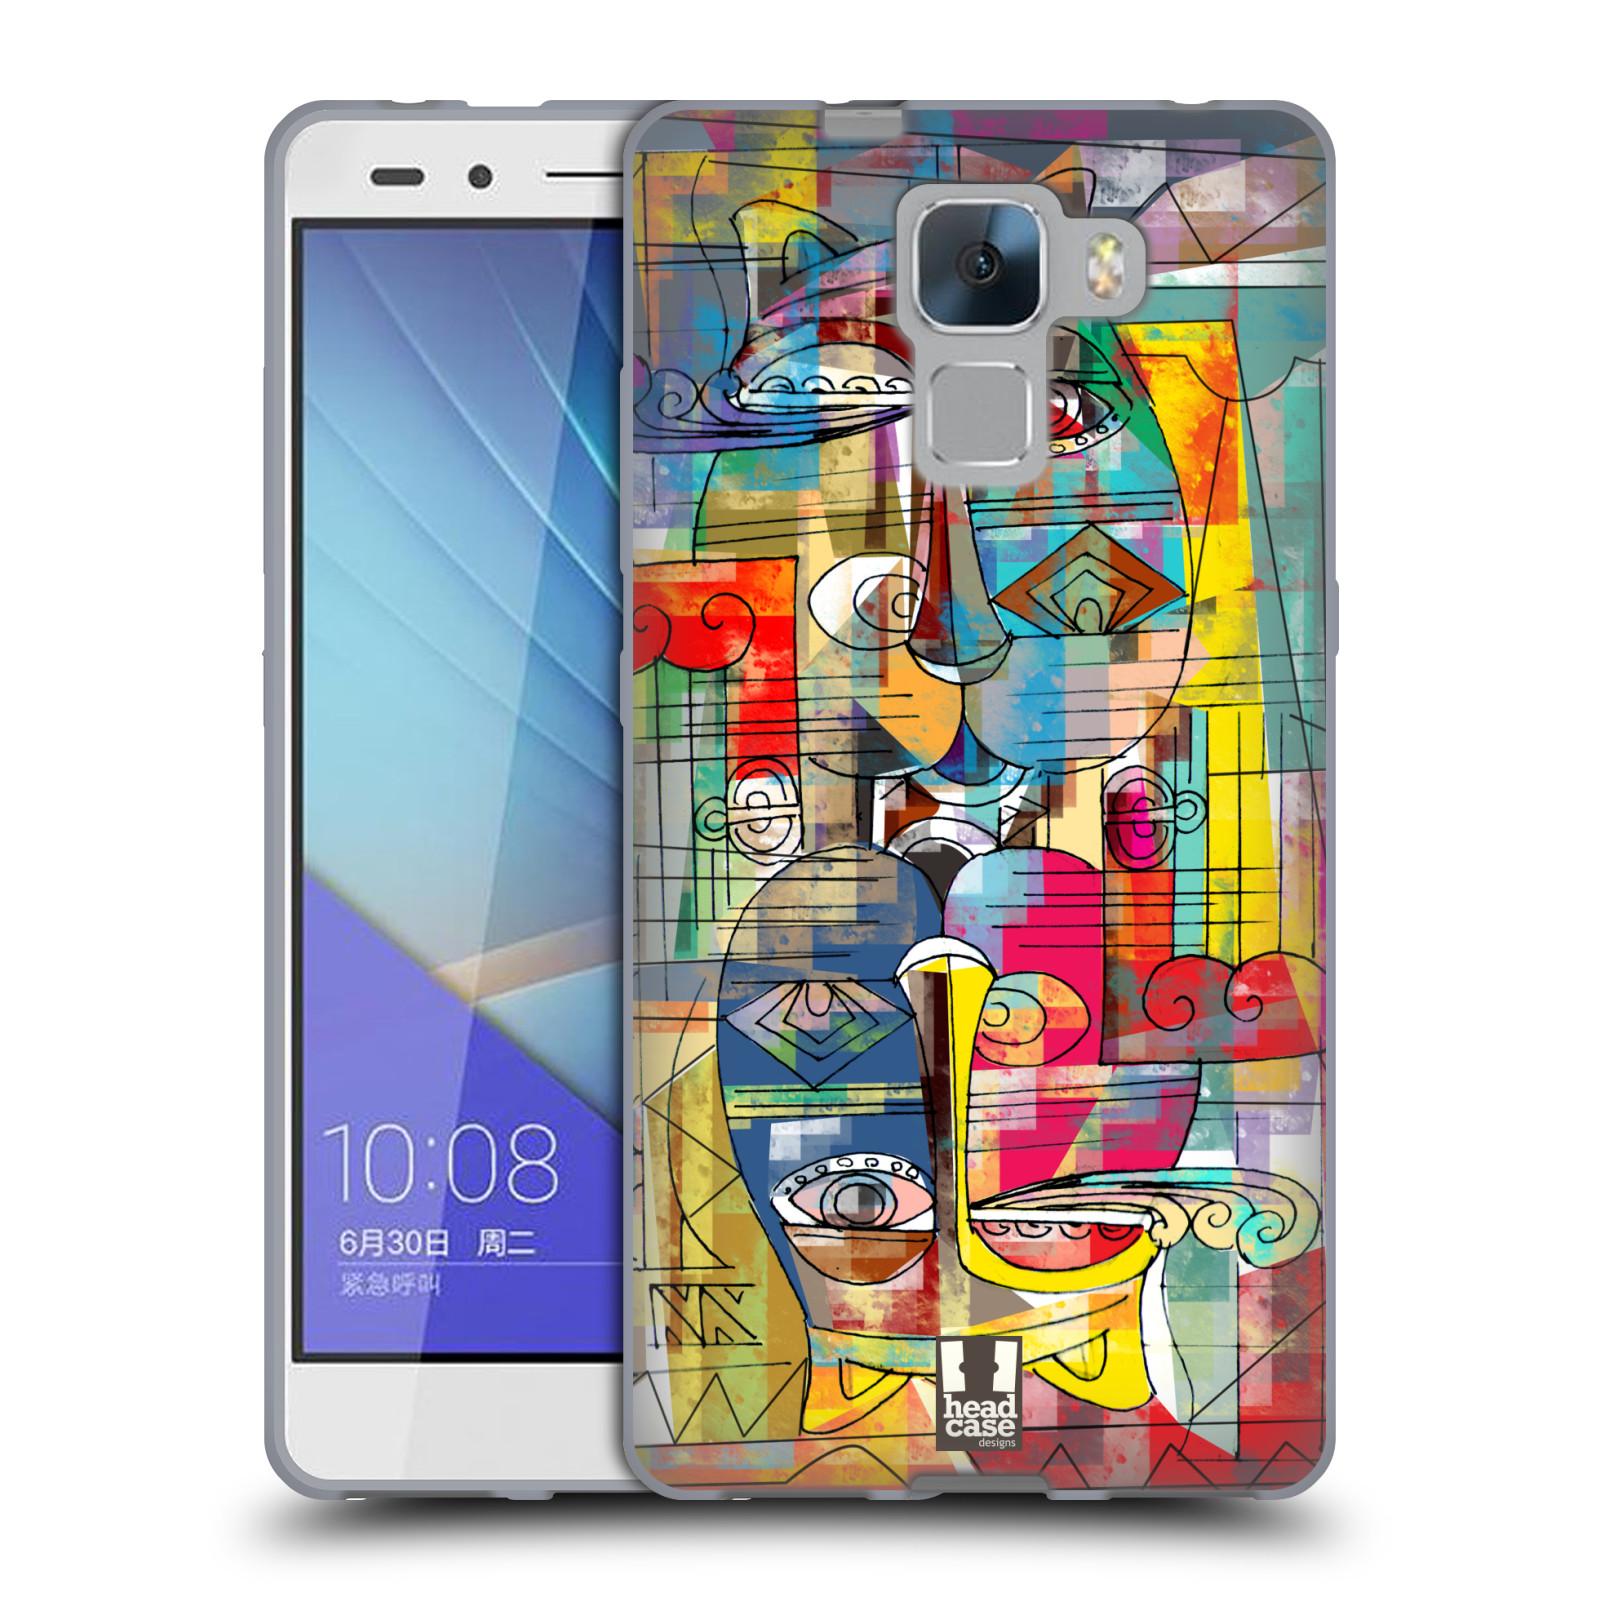 Silikonové pouzdro na mobil Honor 7 HEAD CASE AZTEC MANX